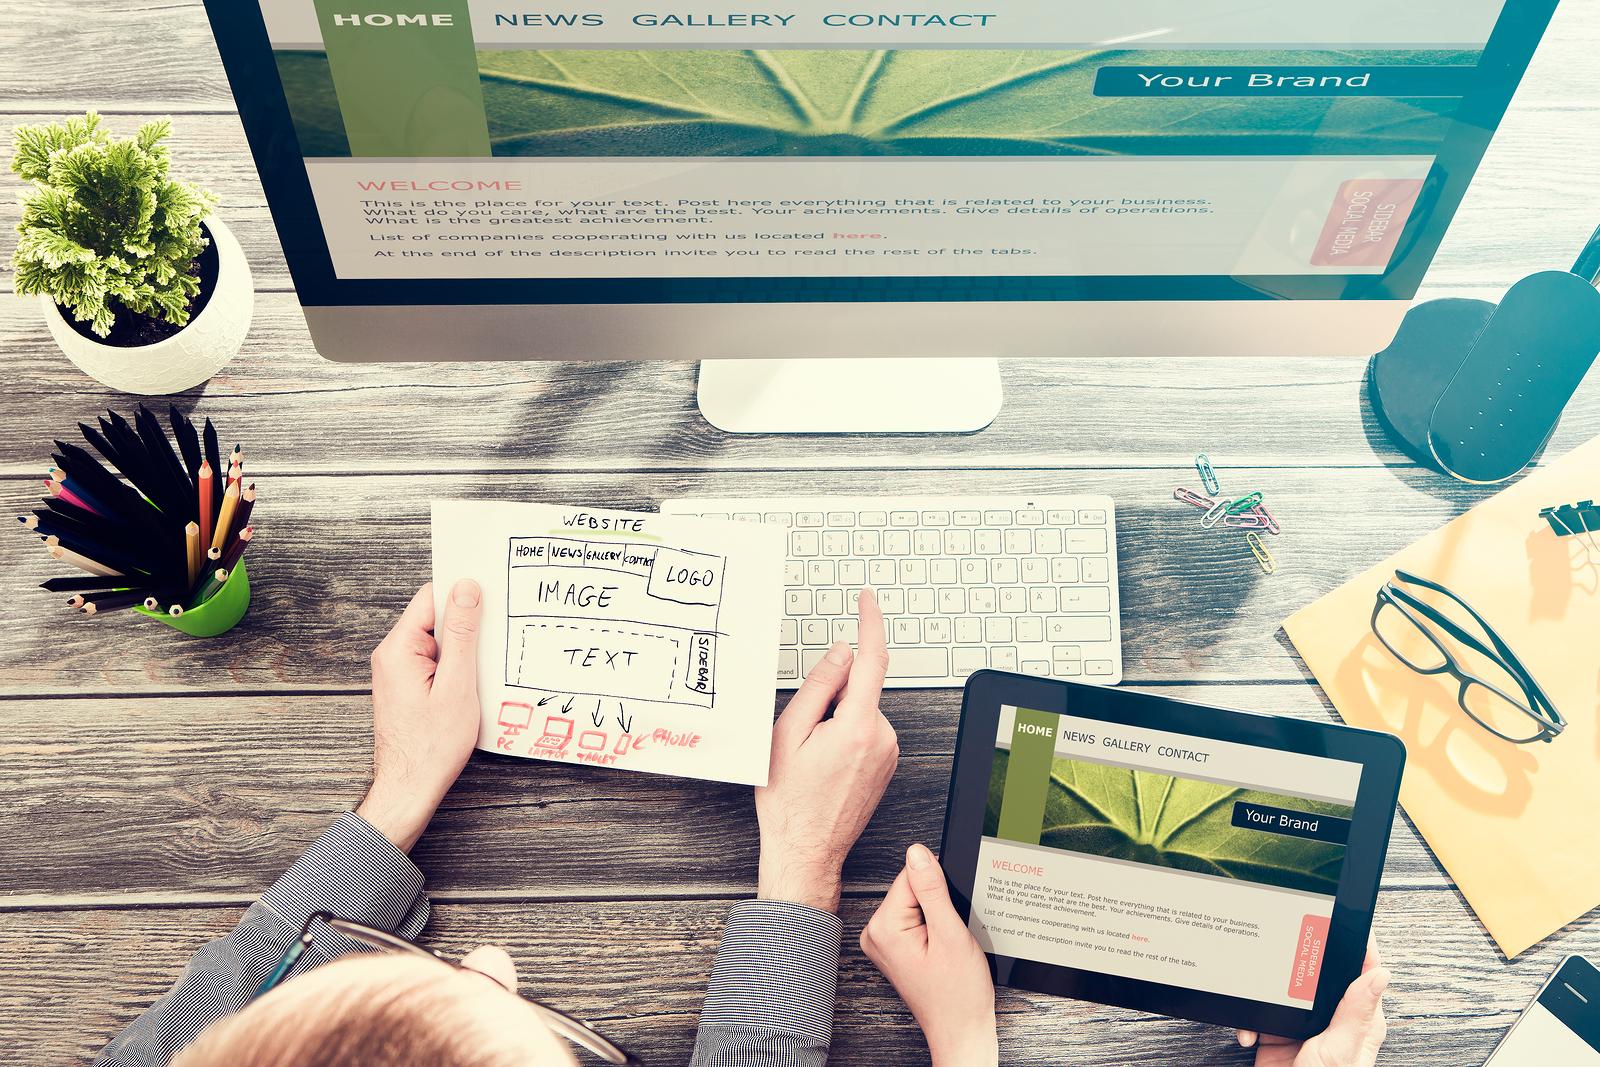 Website designer with responsive web design